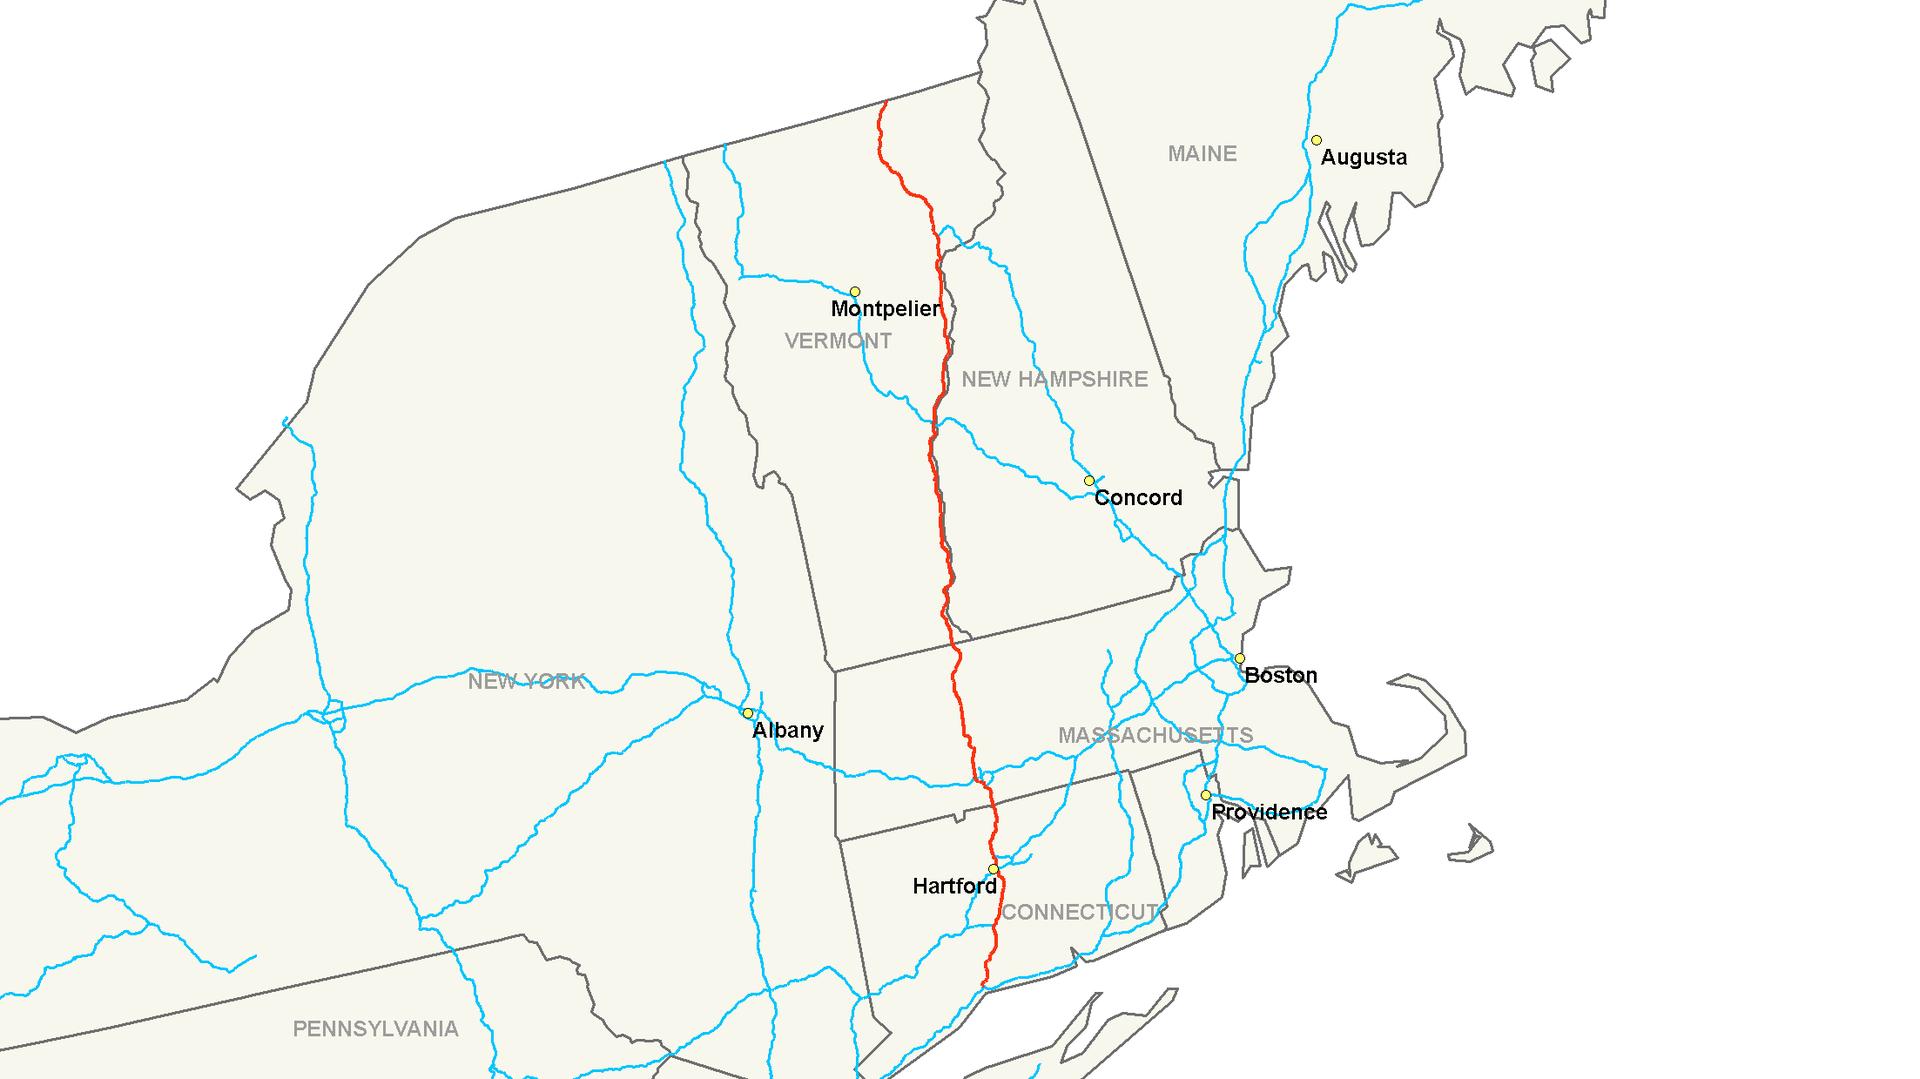 White River Junction Vt >> Interstate 91 - Wikipedia